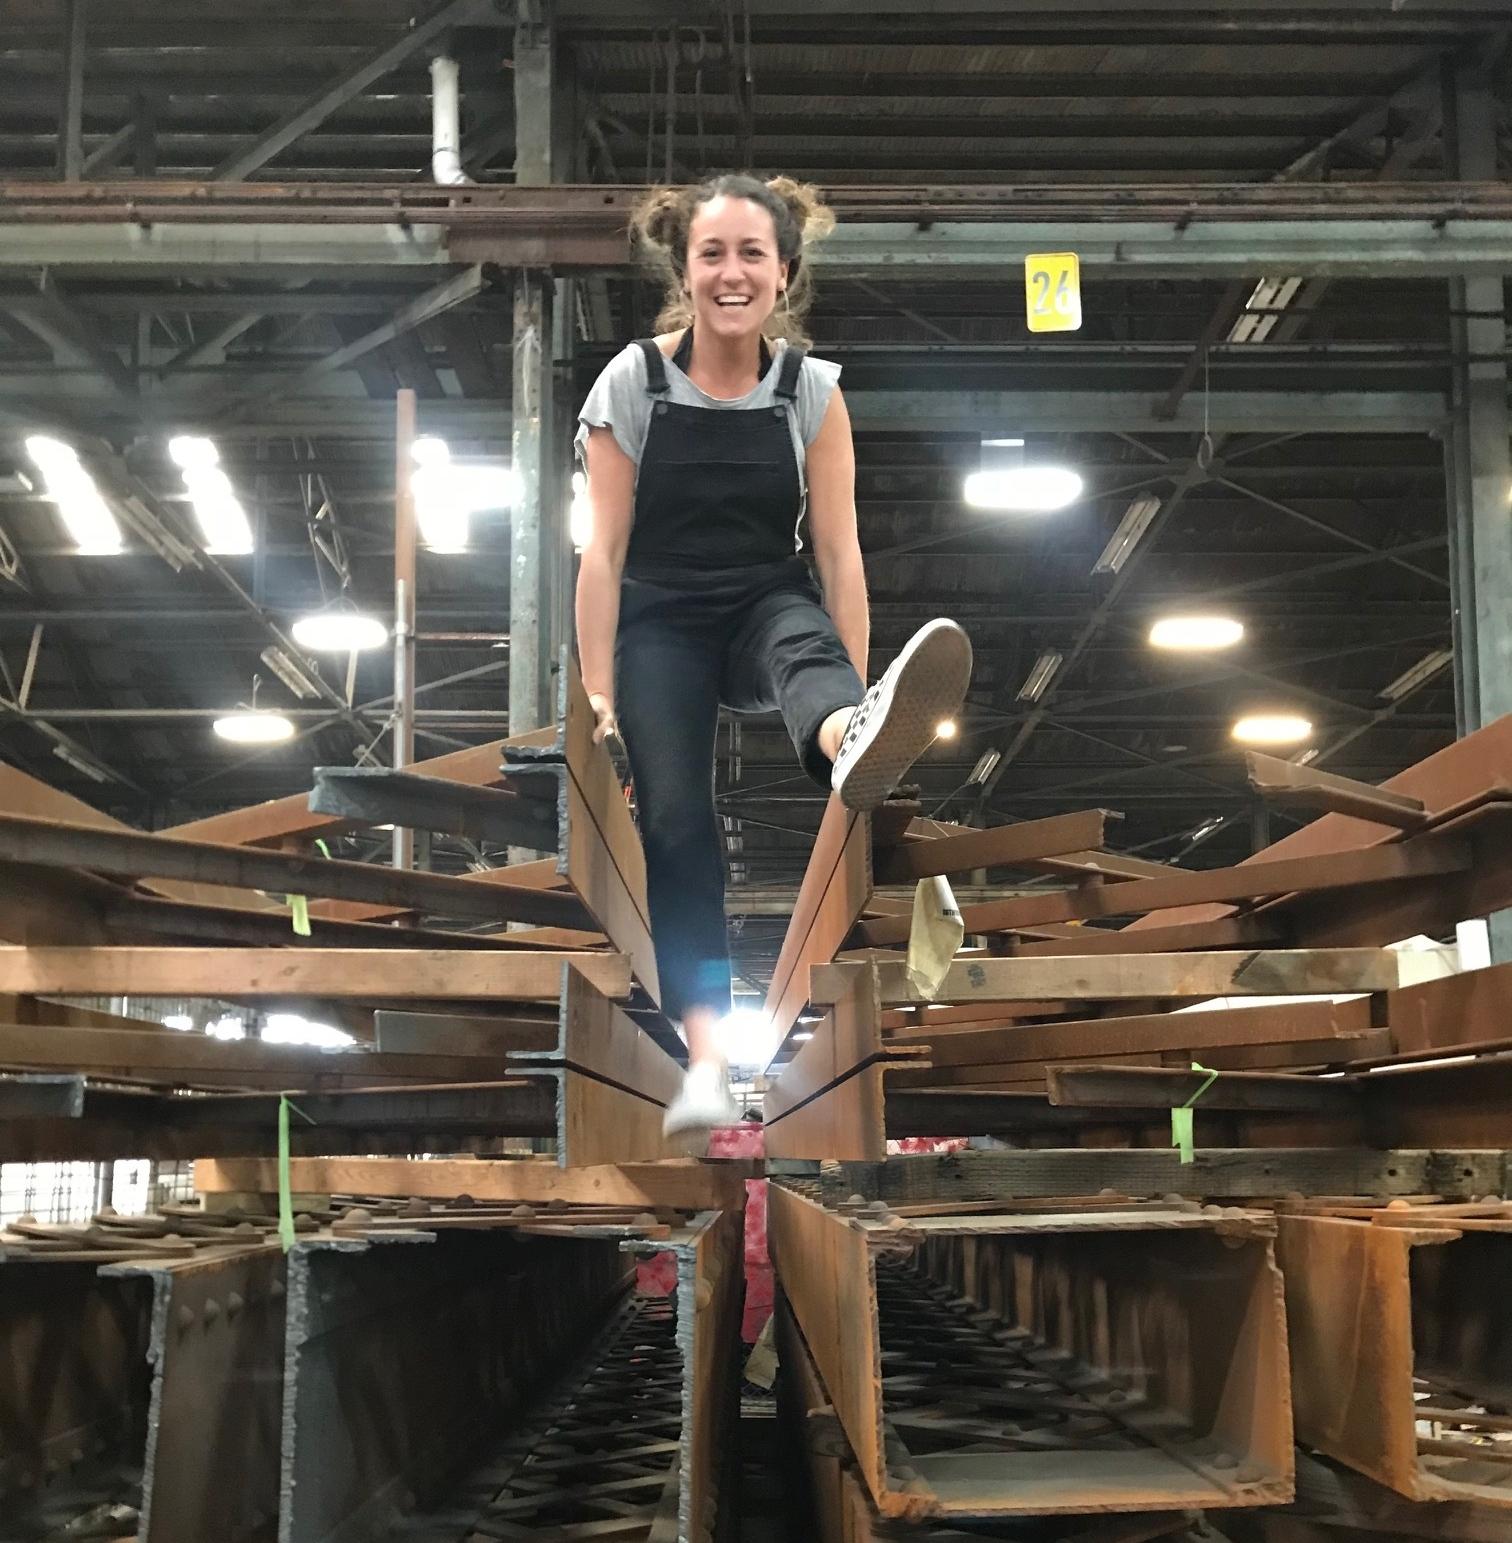 Shannon on top of 49,000 lbs of steel, awarded to artist Katy Boynton from the  Bay Bridge Steel Program